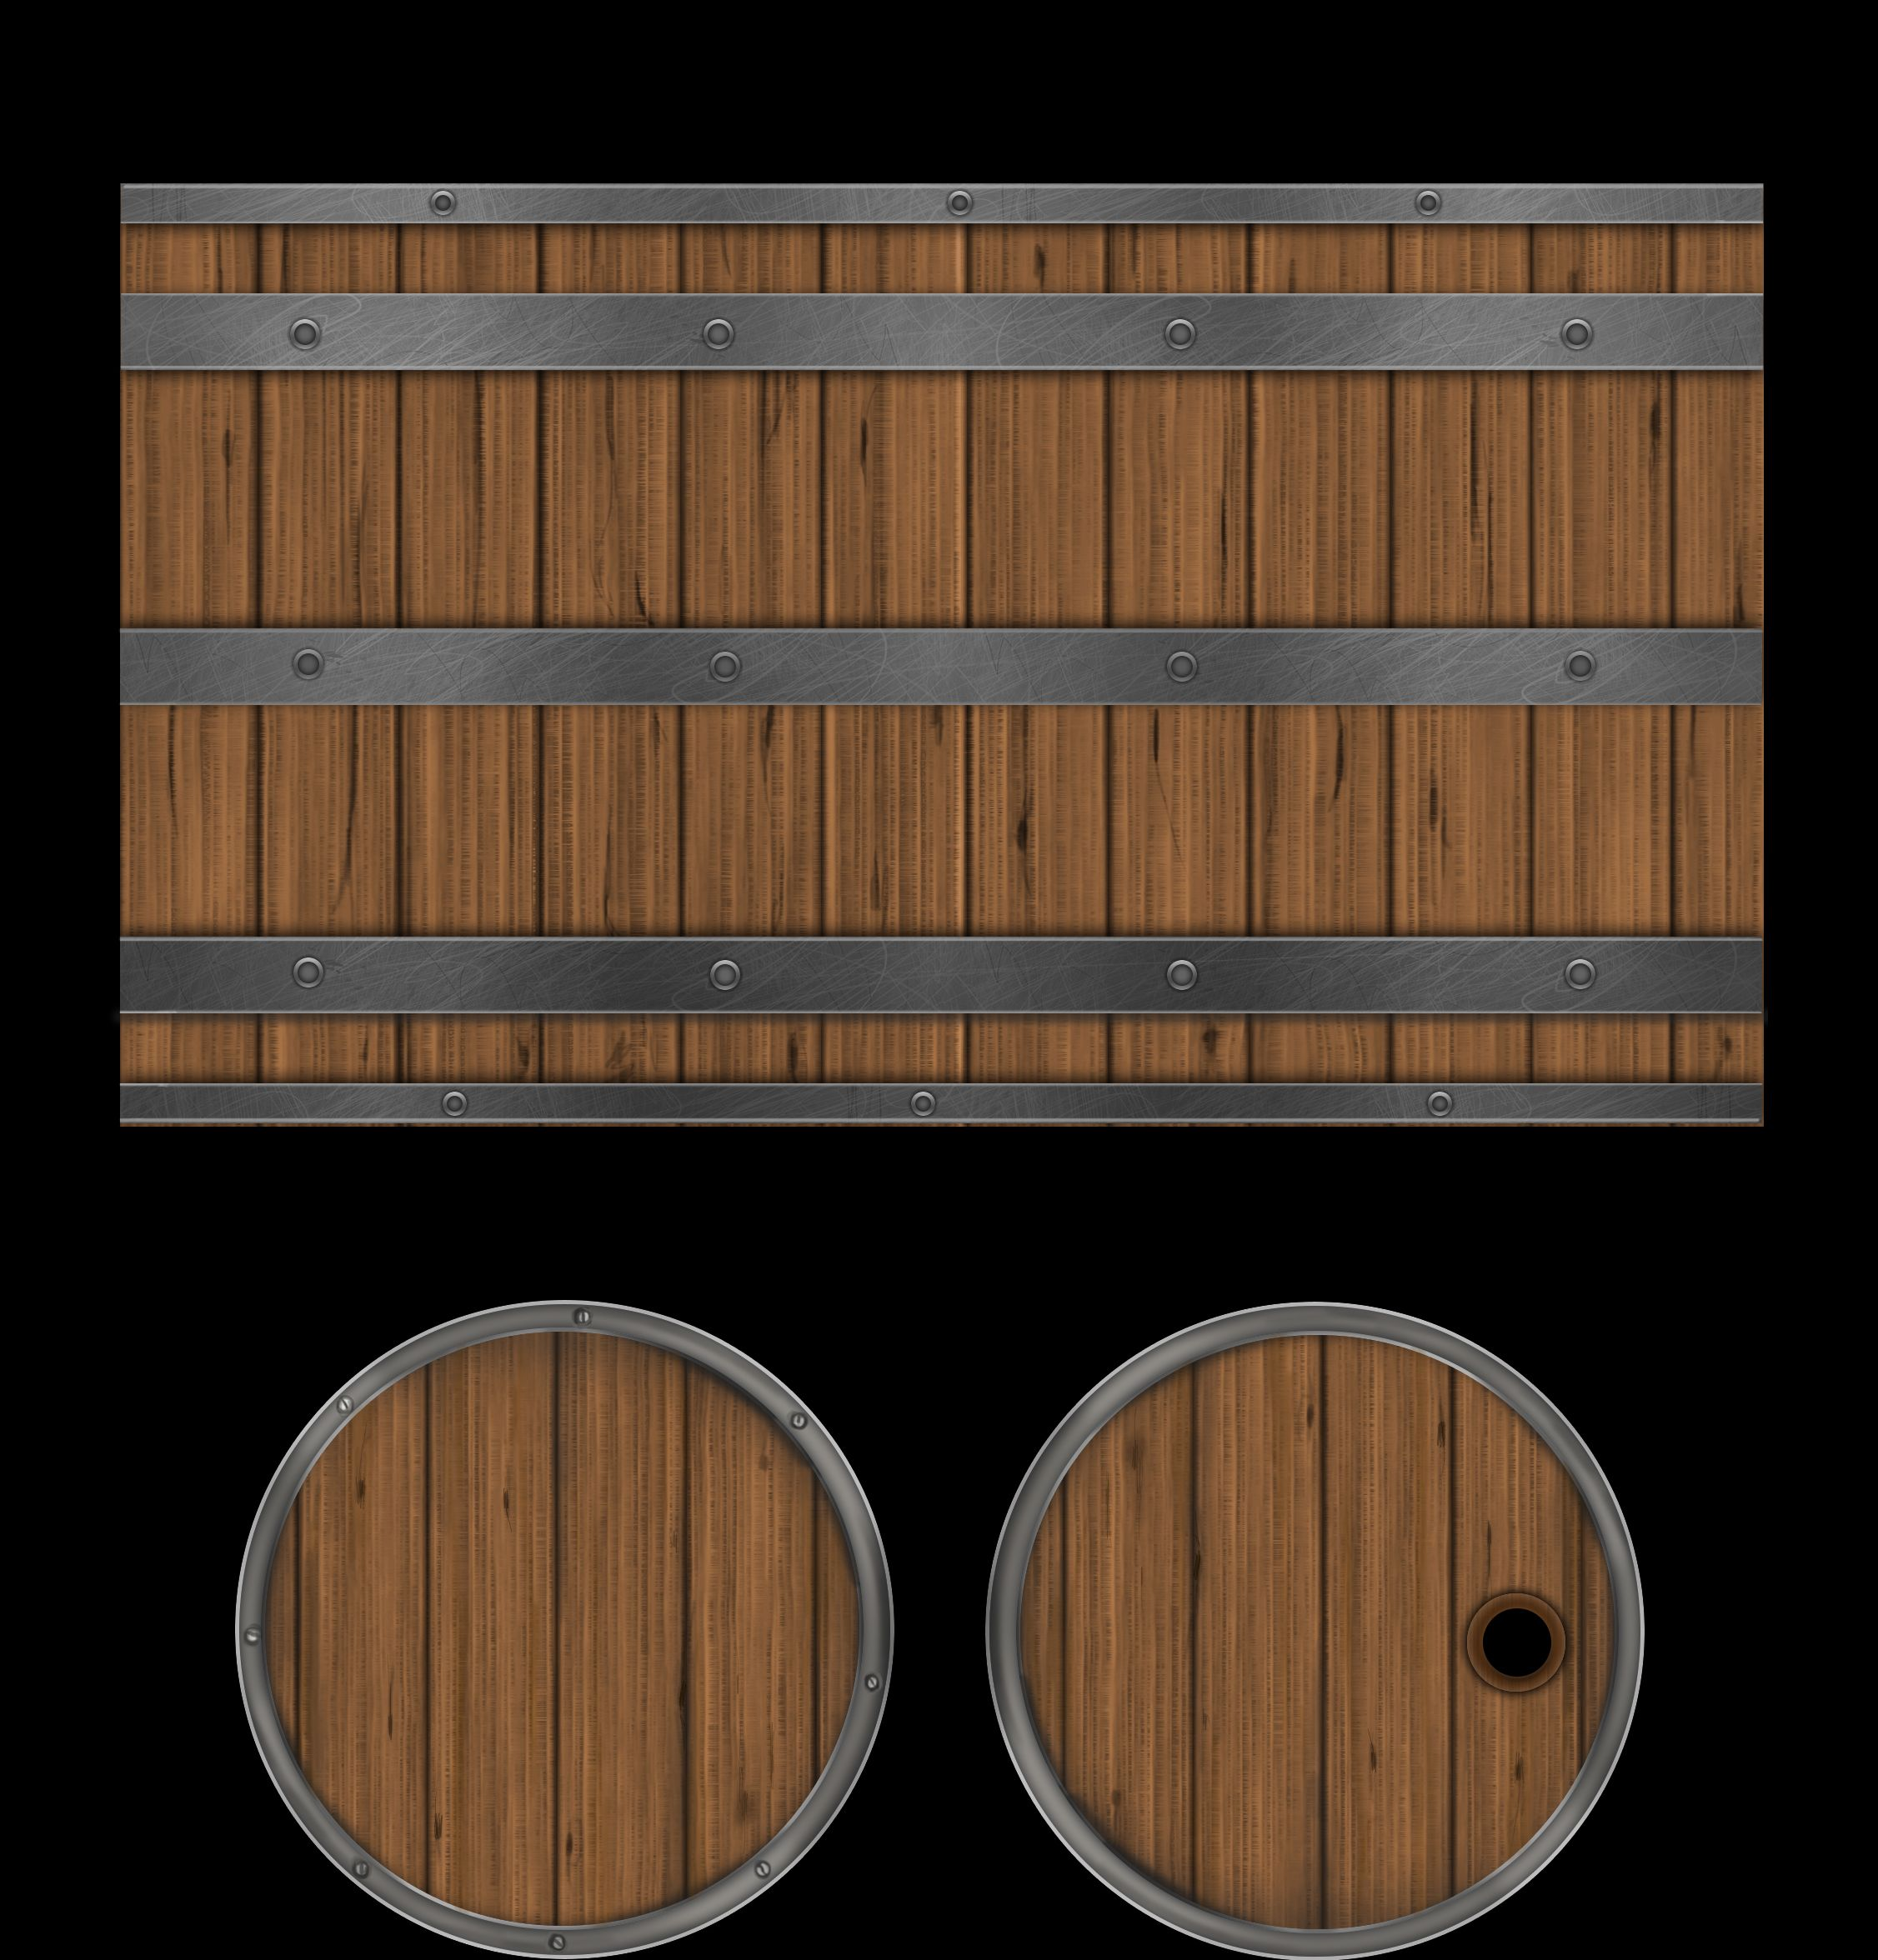 Tibirogue 2015 Barrel Texture Hand Painted Textures Texture